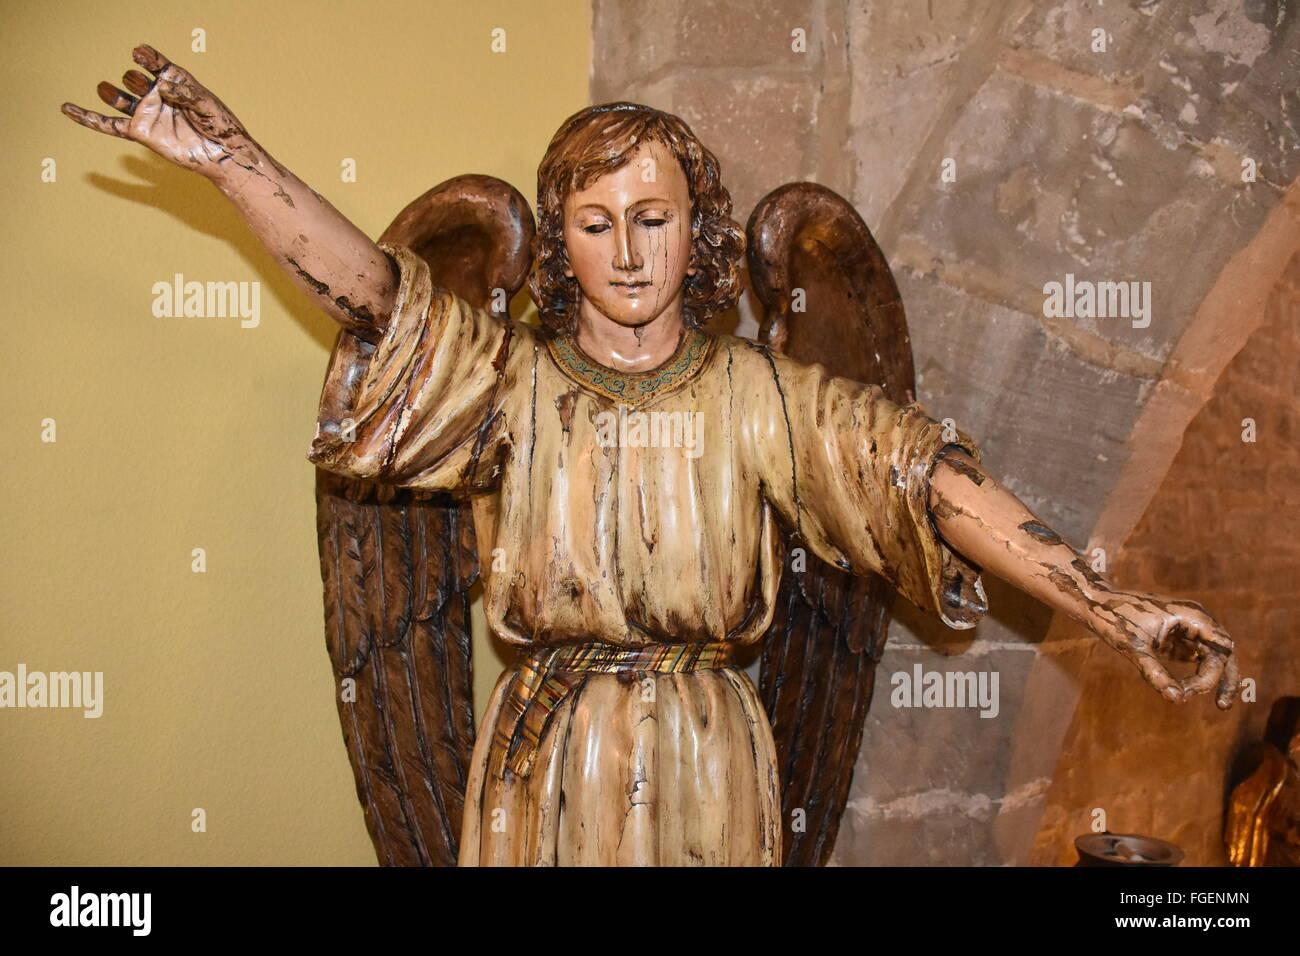 Angel on the stairs of the parador of Santo Domingo de la Calzada - Stock Image